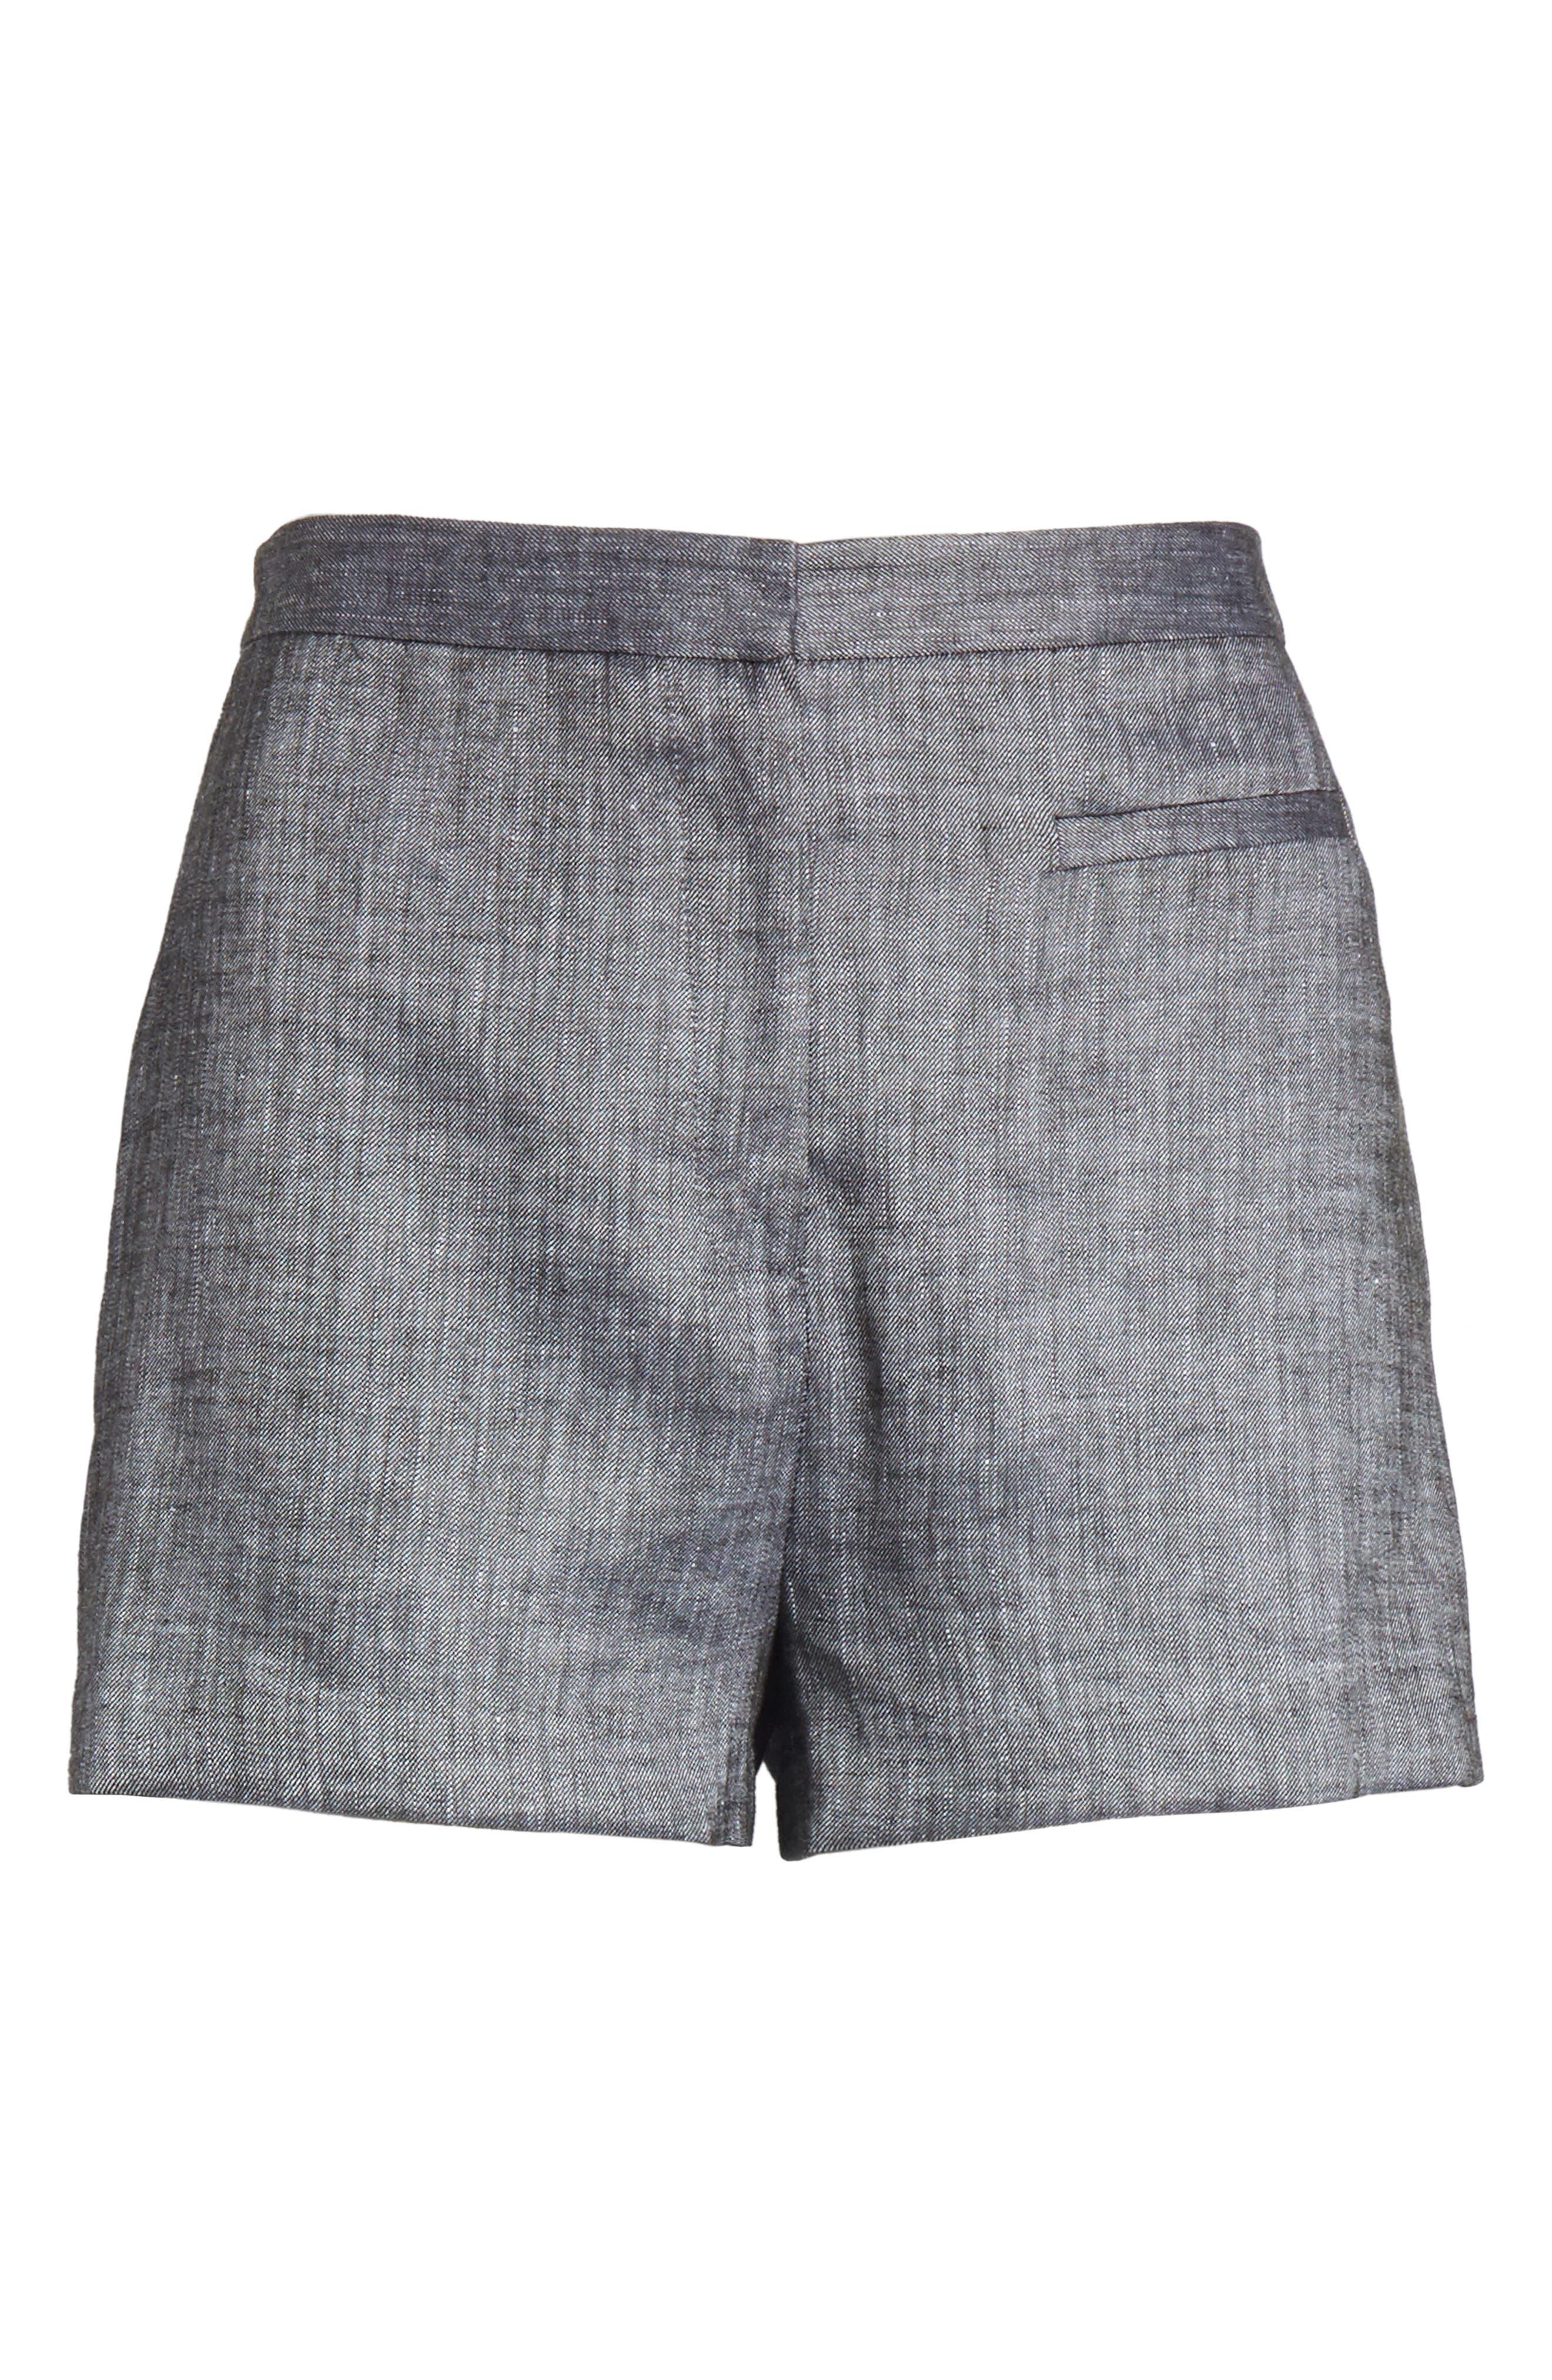 Trudee High Waist Shorts,                             Alternate thumbnail 6, color,                             309